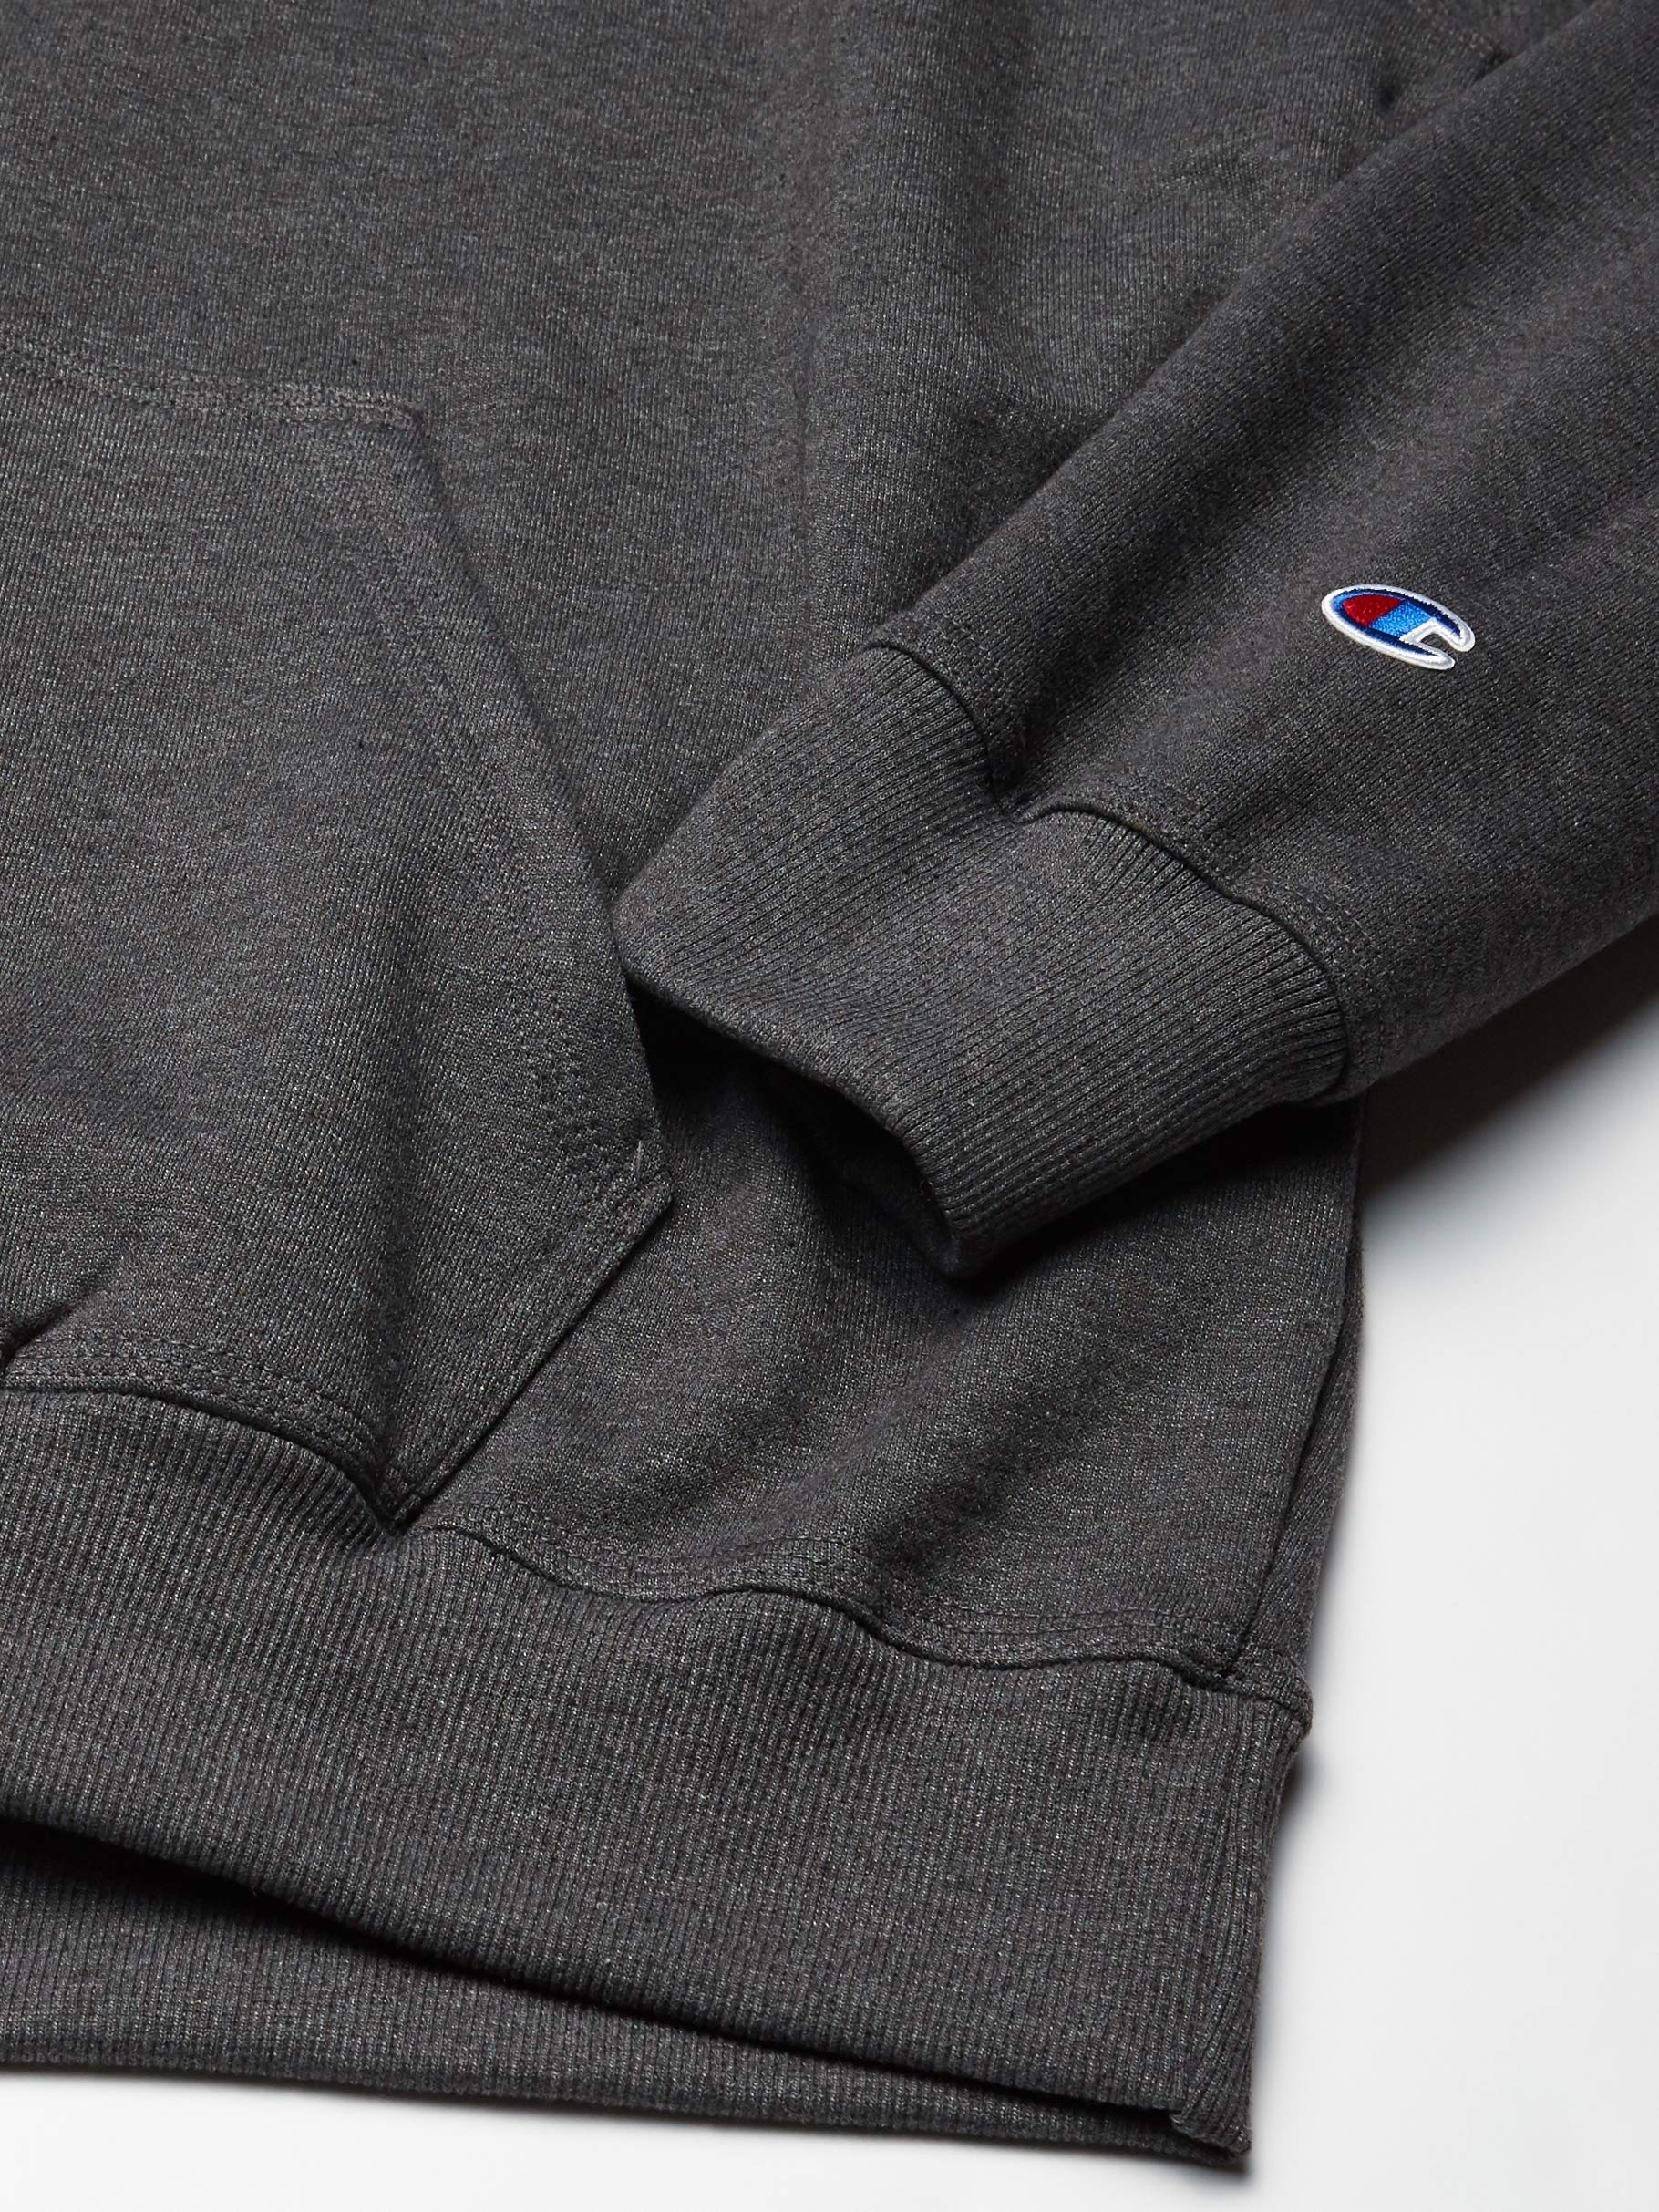 Fashion Shopping Champion Men's Powerblend Fleece Pullover Hoodie, Applique Script